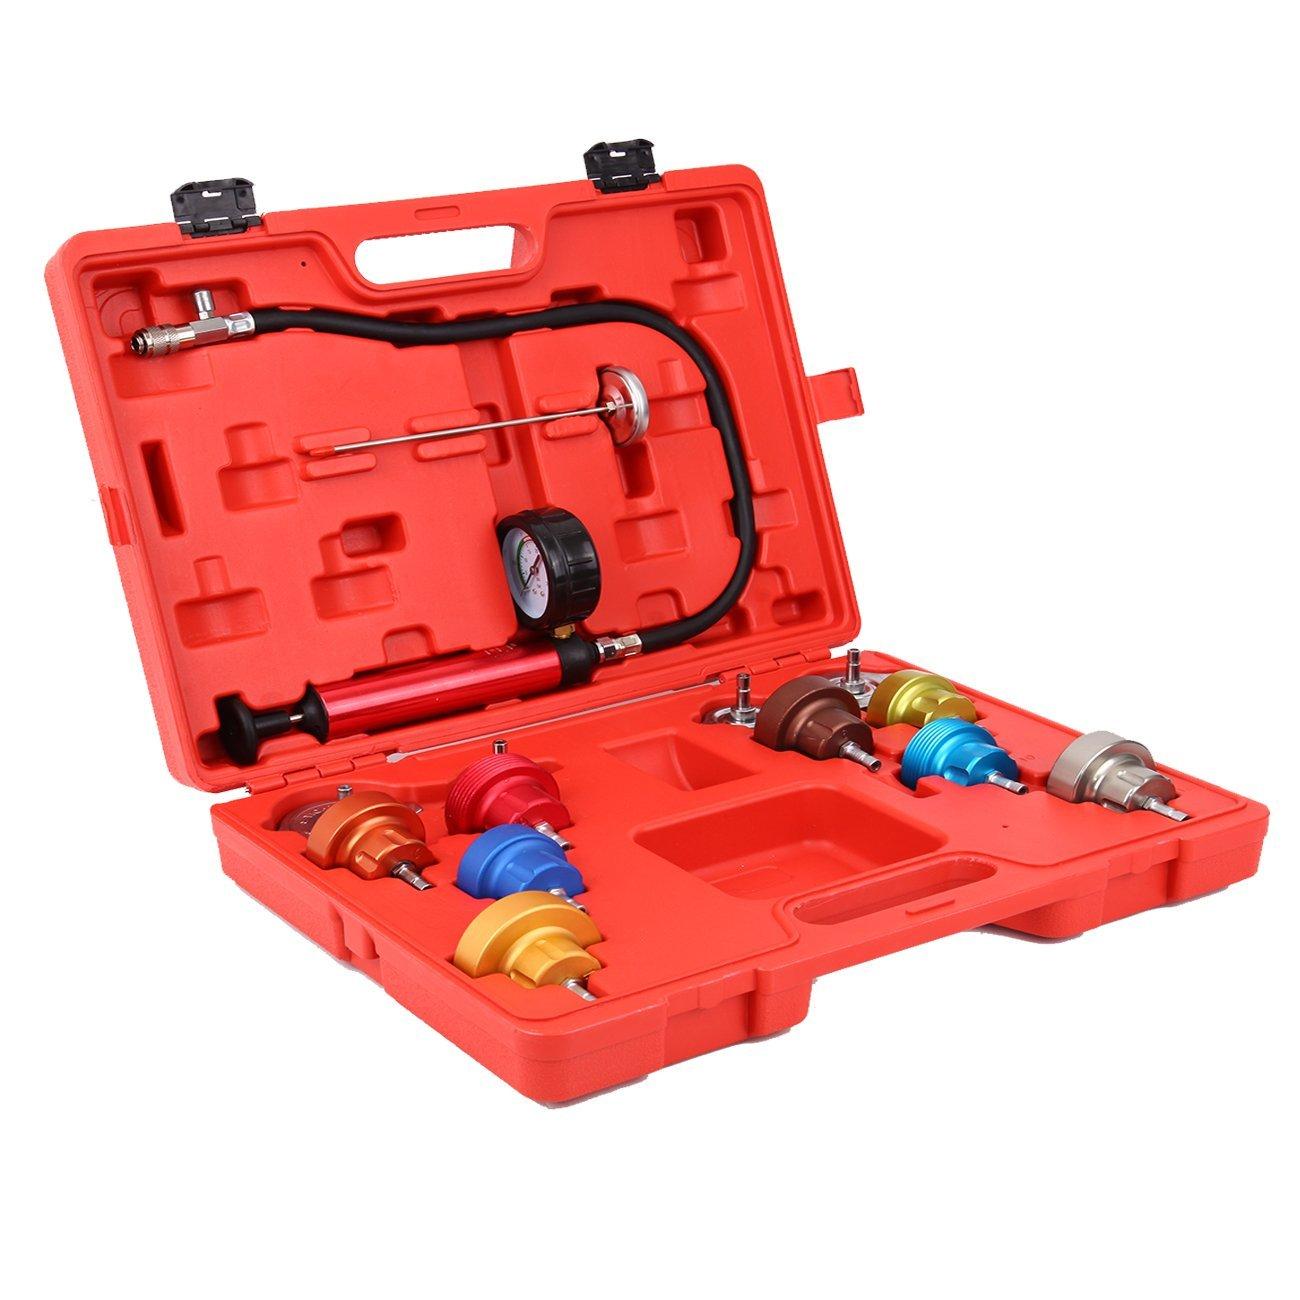 Ridgeyard 14pc Universal Car Radiator Pressure and Vacuum Tester Cooling System Tester Head Gasket Leak Detector Kit